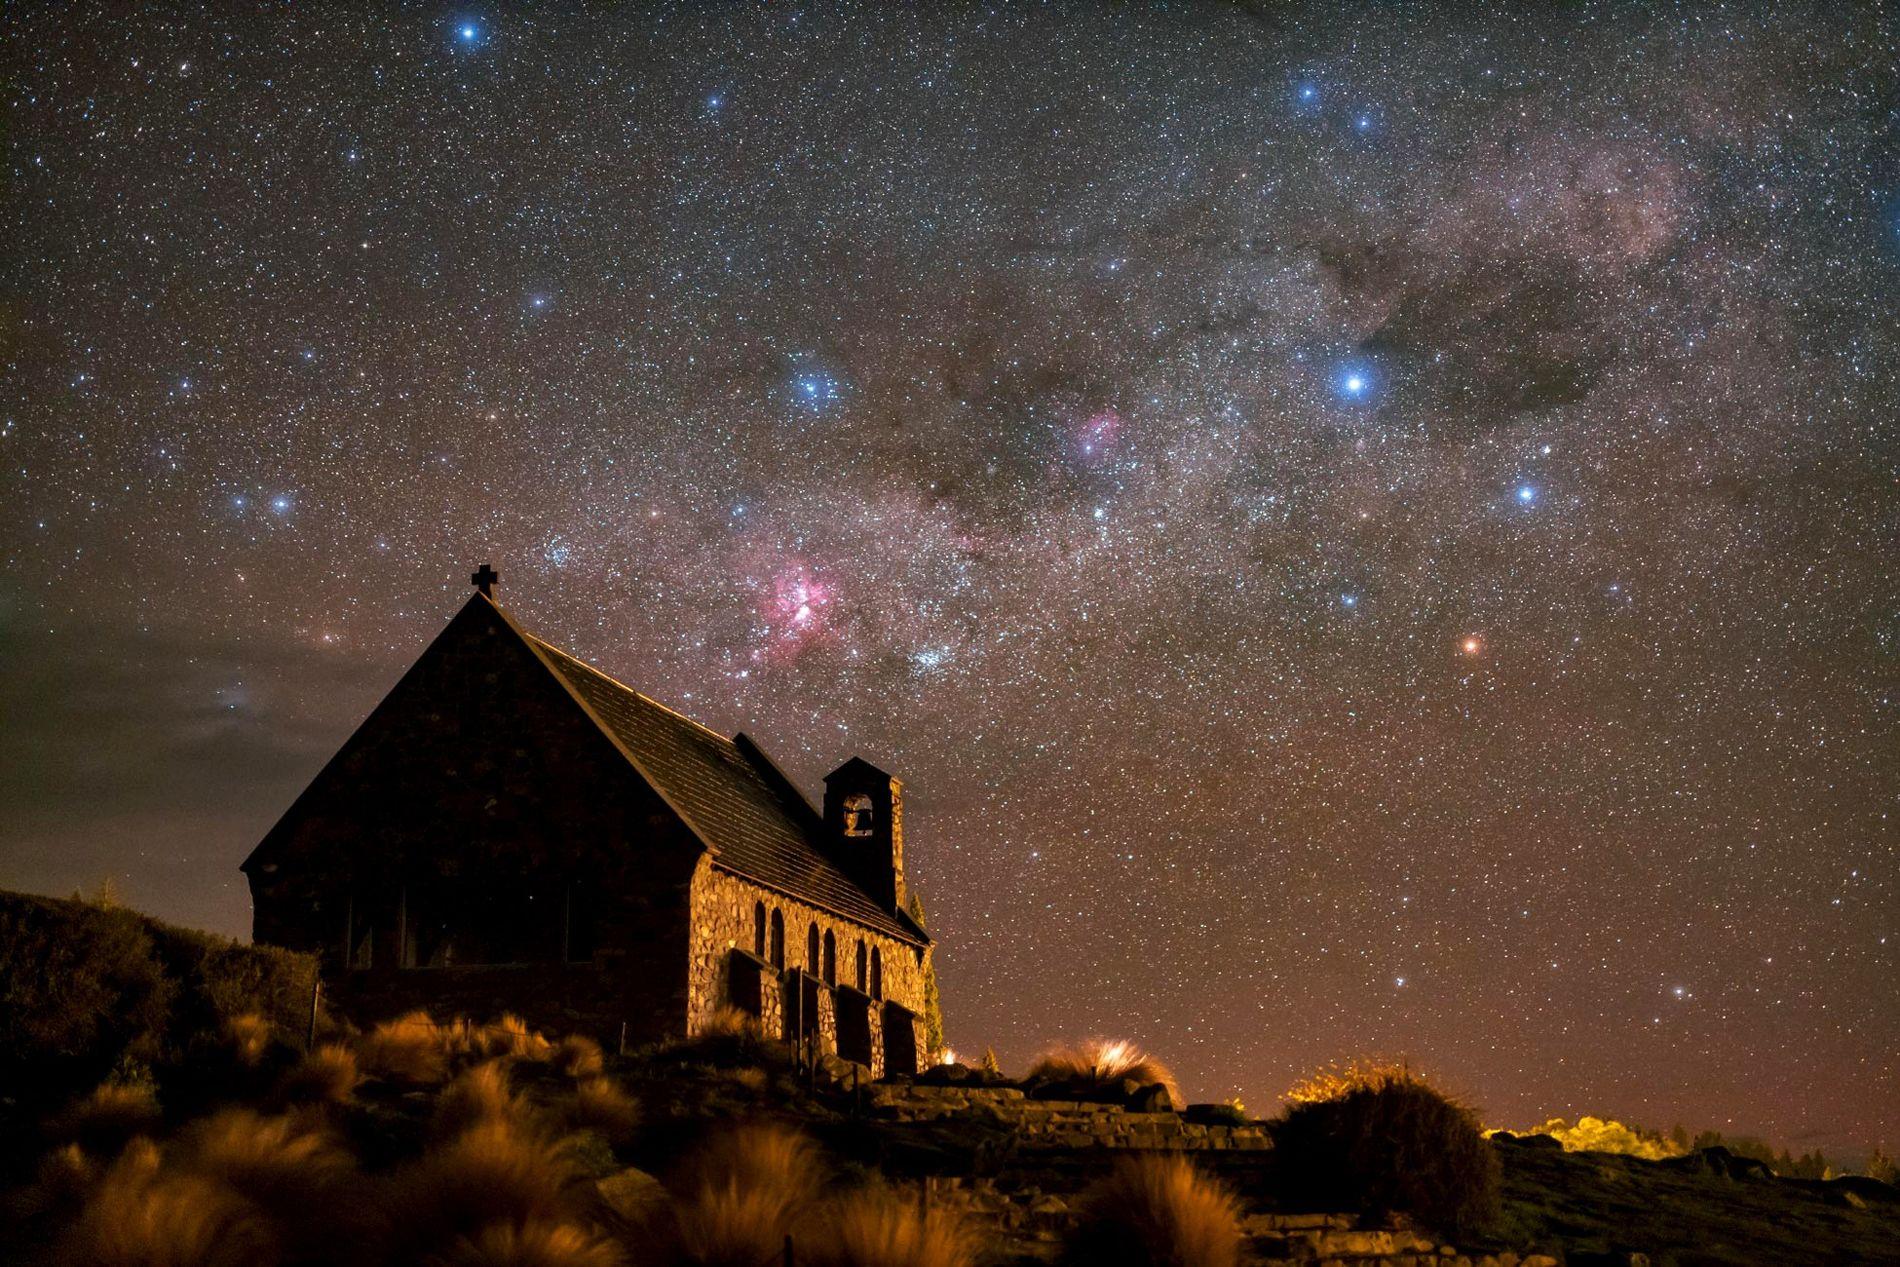 Stars sprawl above the Church of the Good Shepherd in New Zealand's Aoraki Mackenzie Reserve.